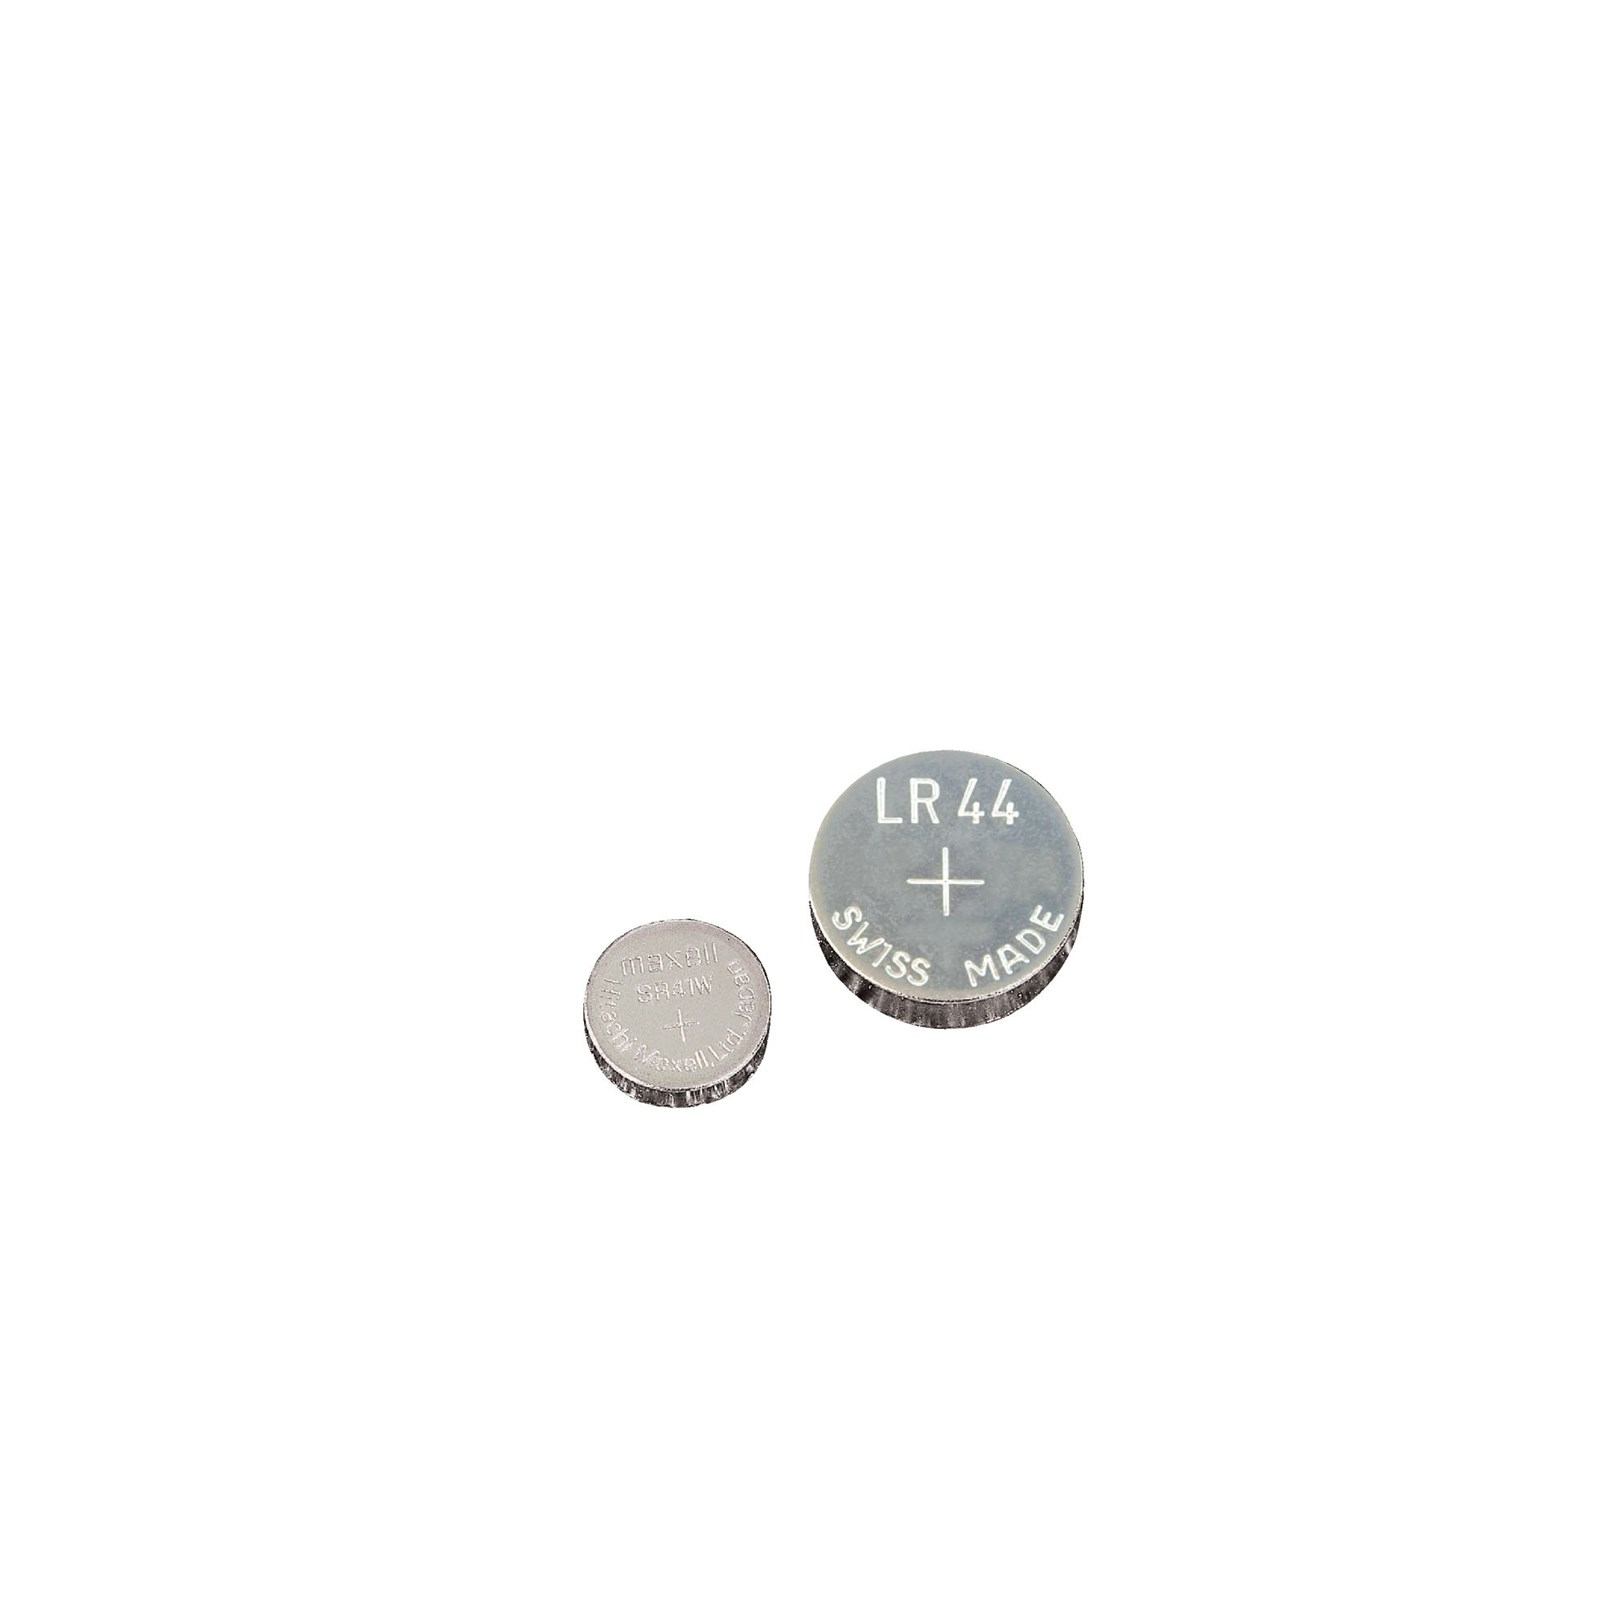 Silver Oxide button cell - LR44